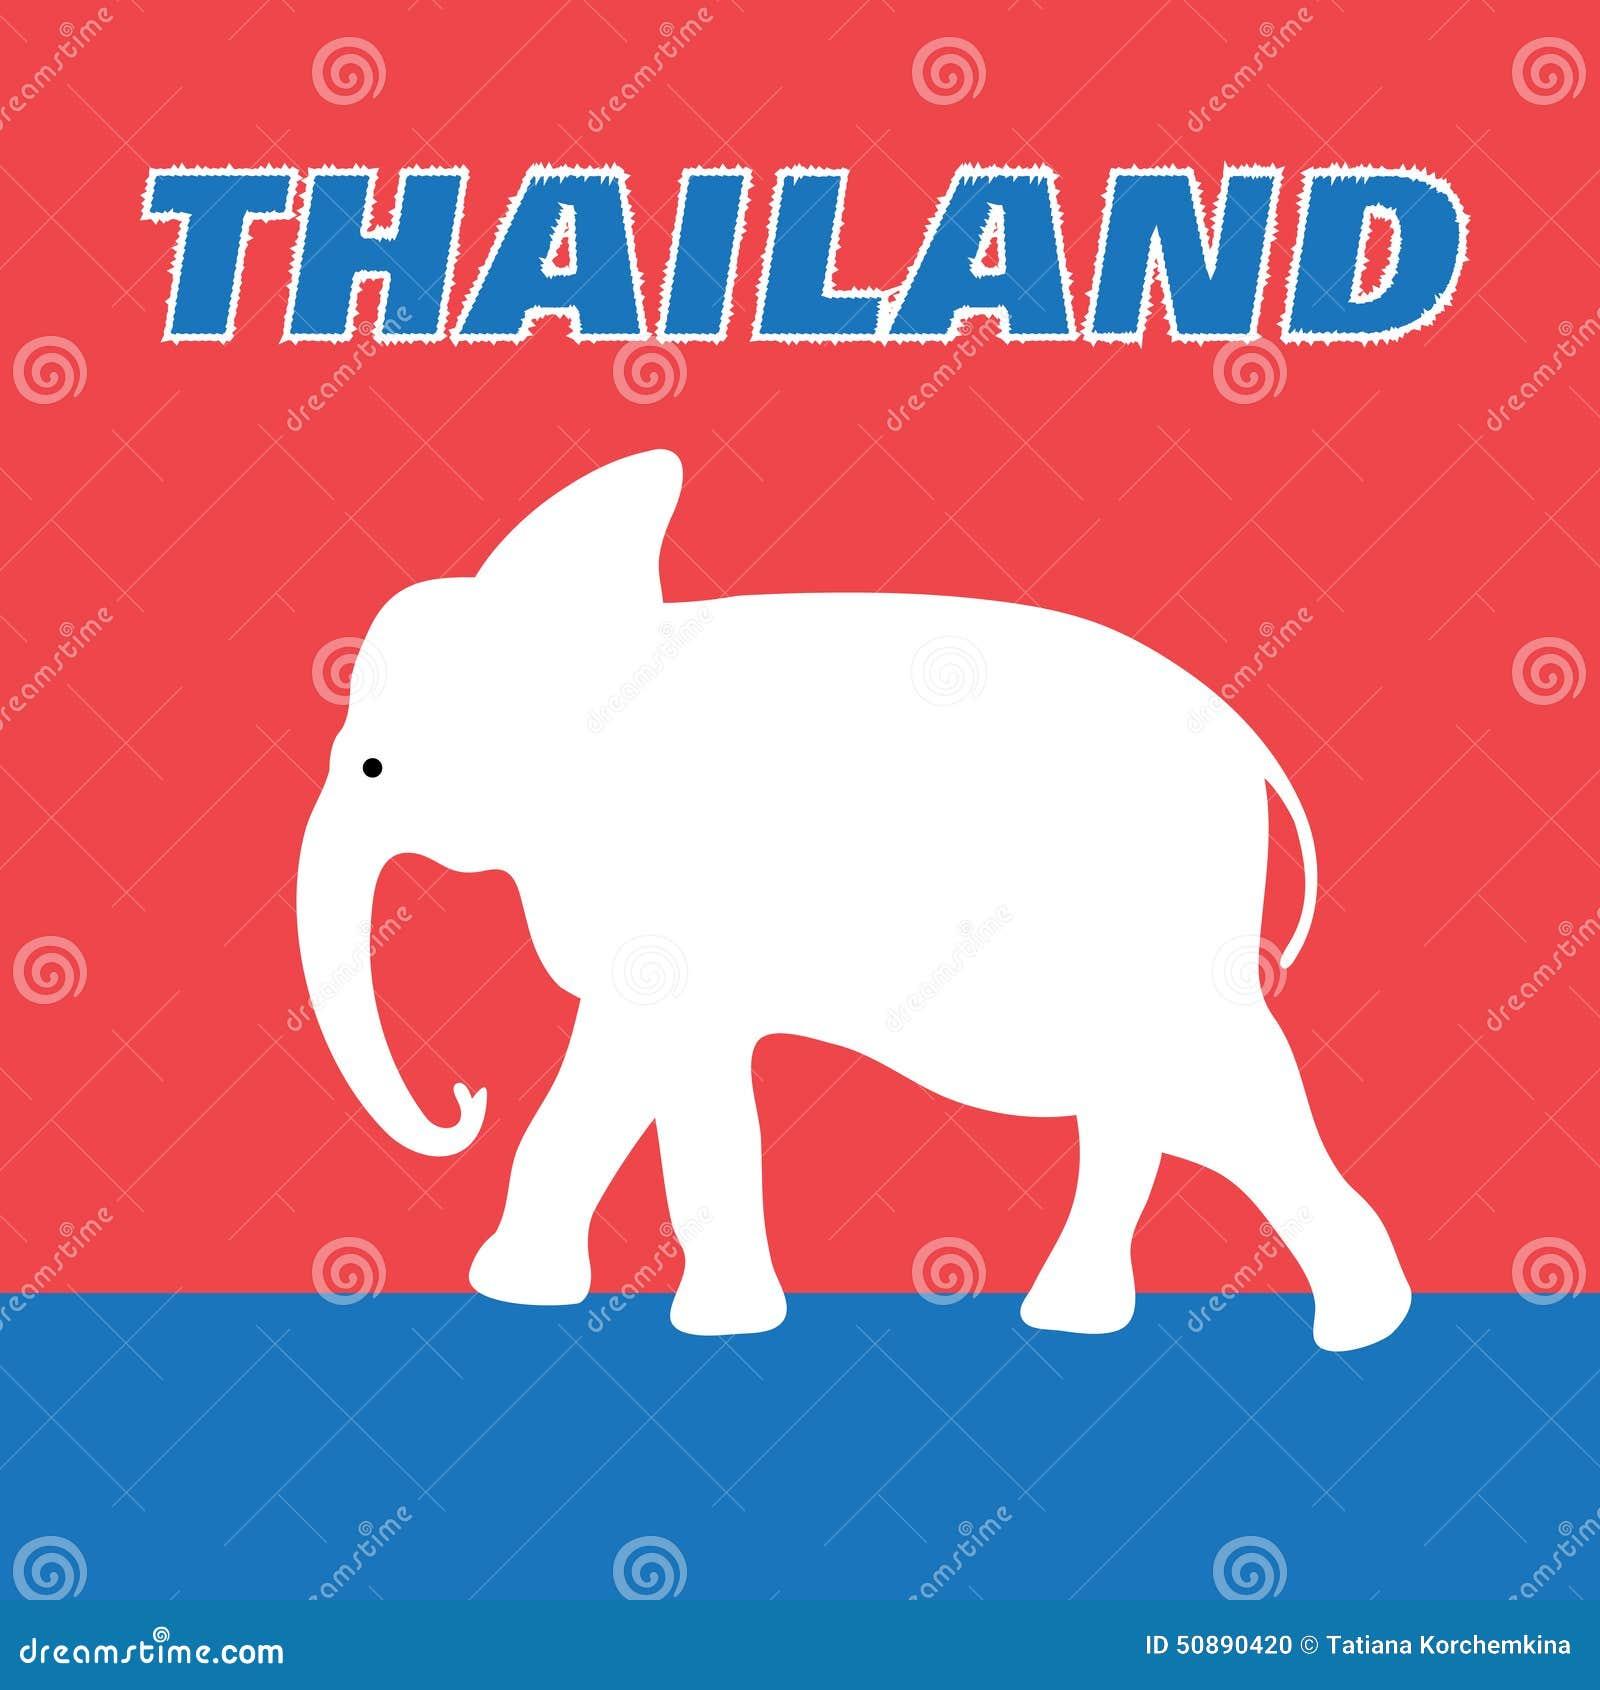 Beautiful Elephant Symbol Of Thailand Stock Vector Illustration Of